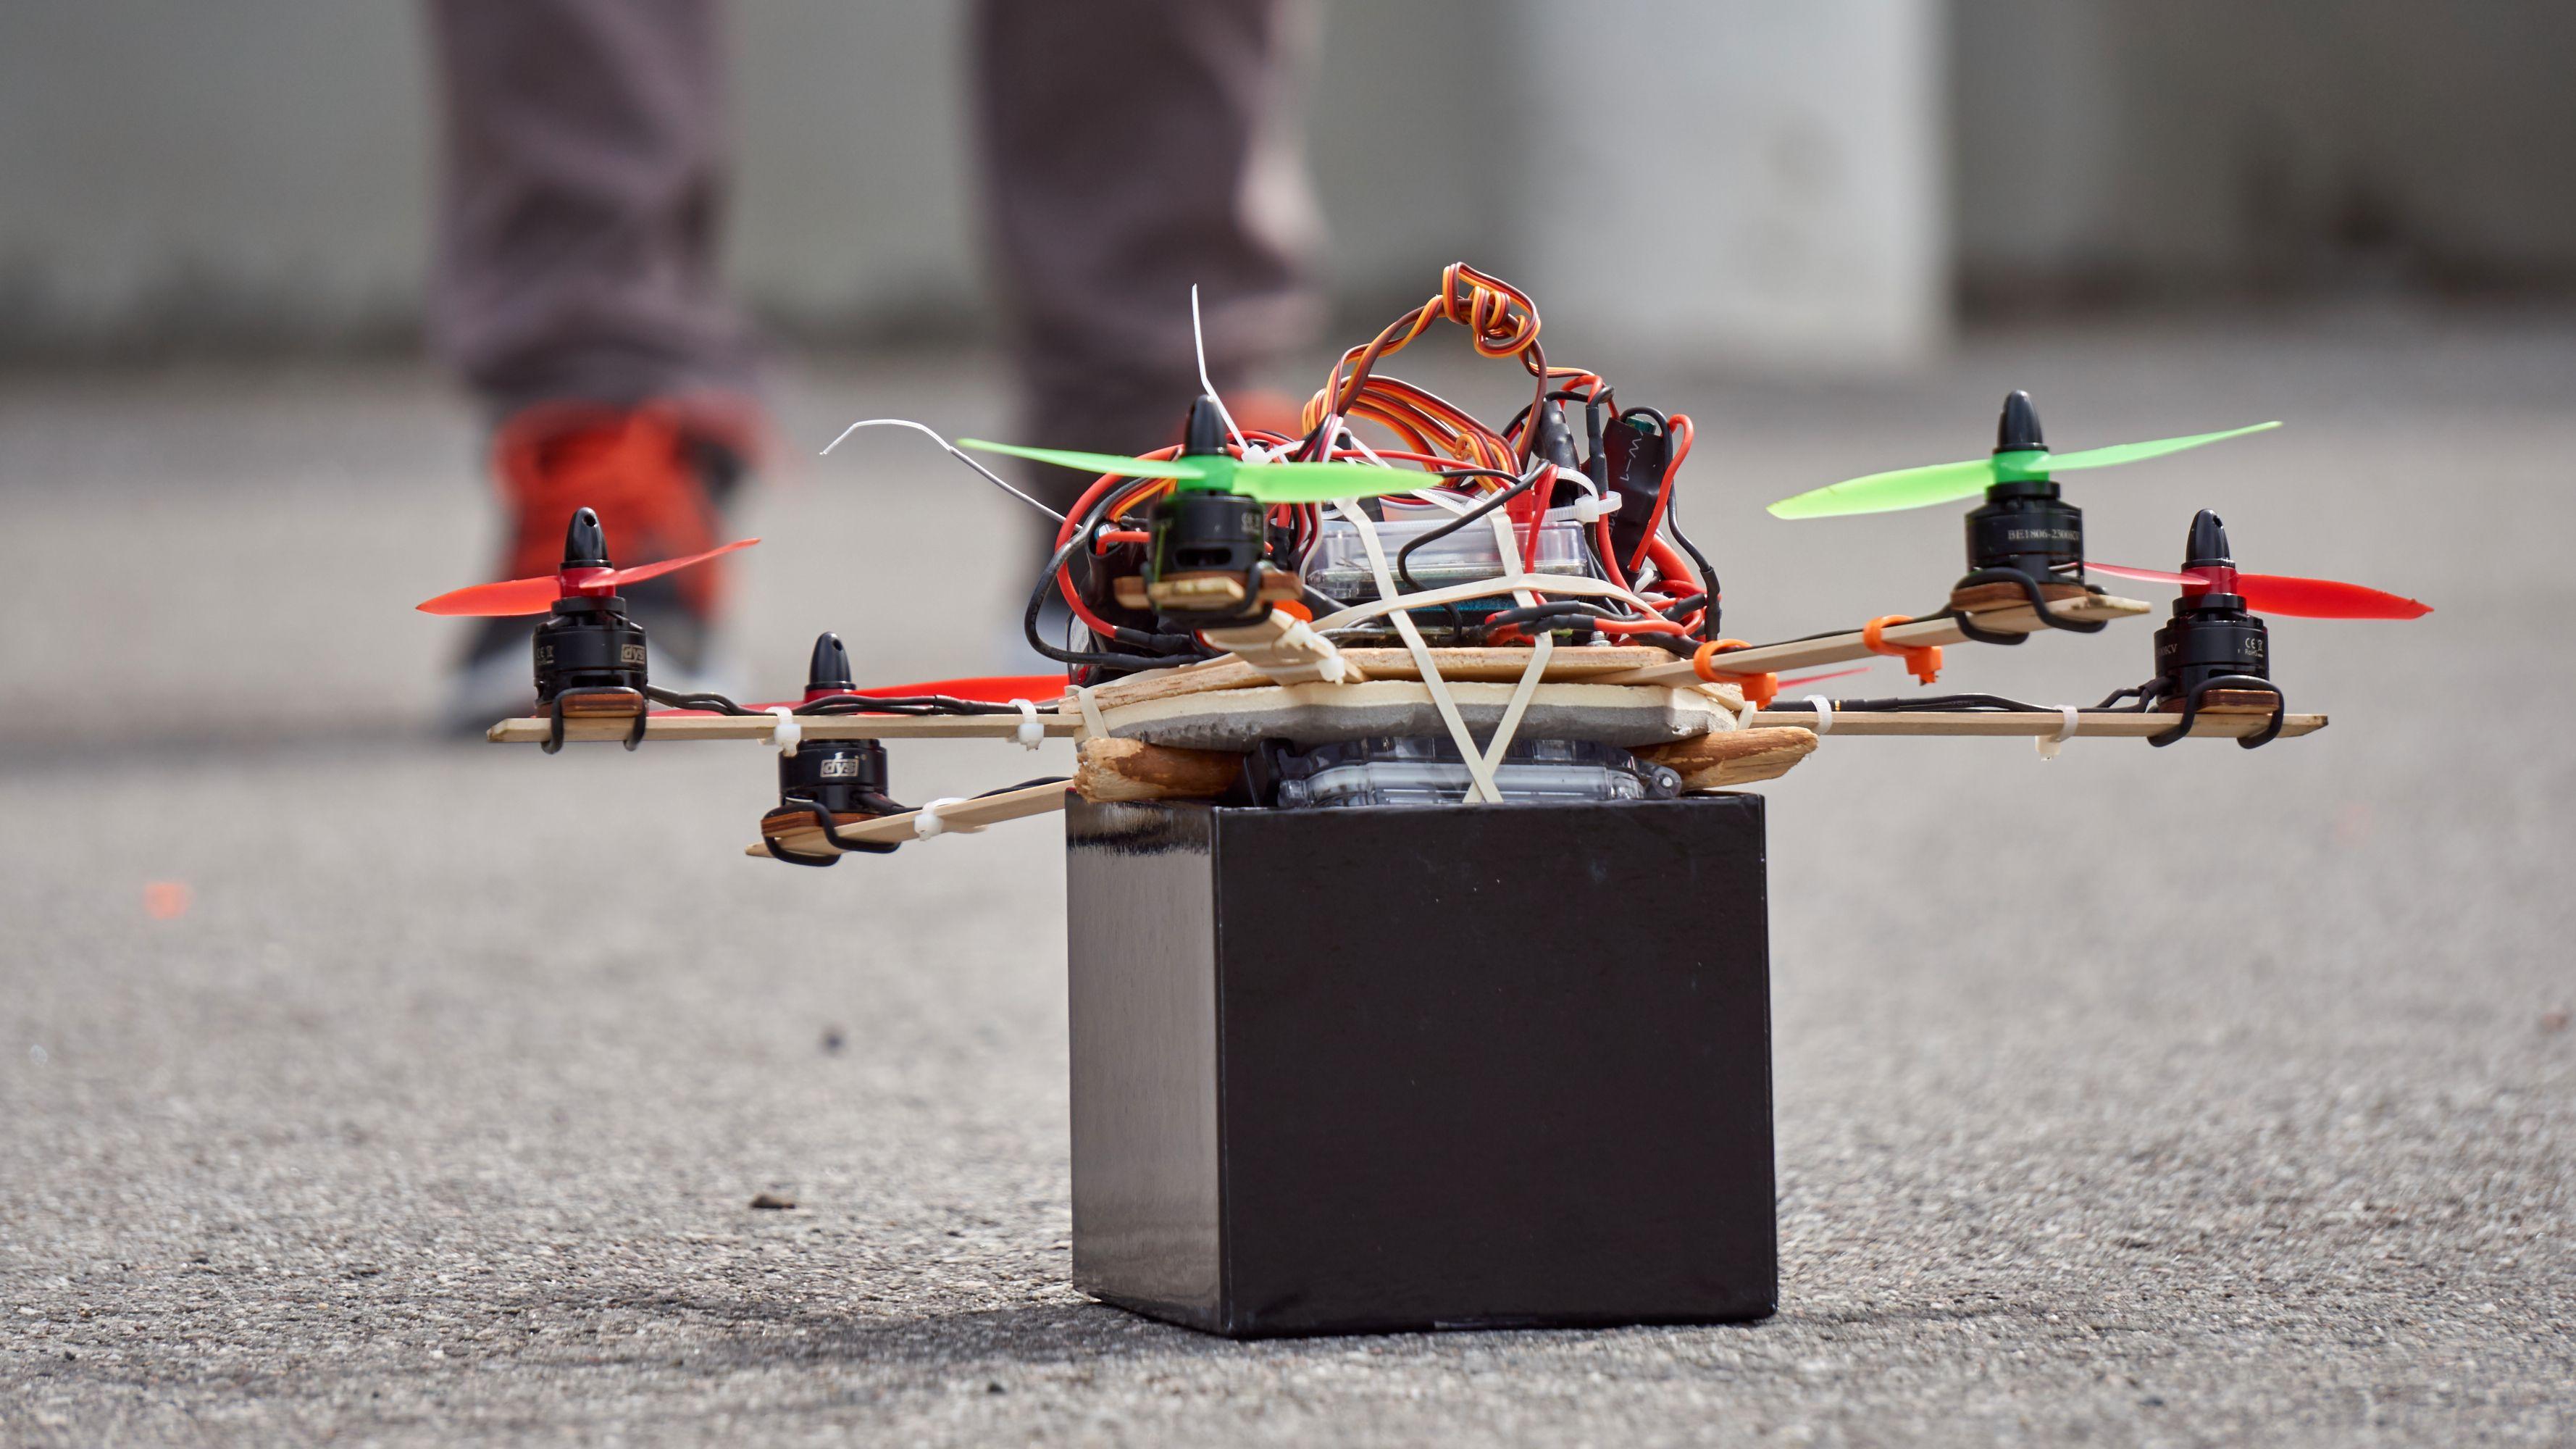 Selvbygde droner